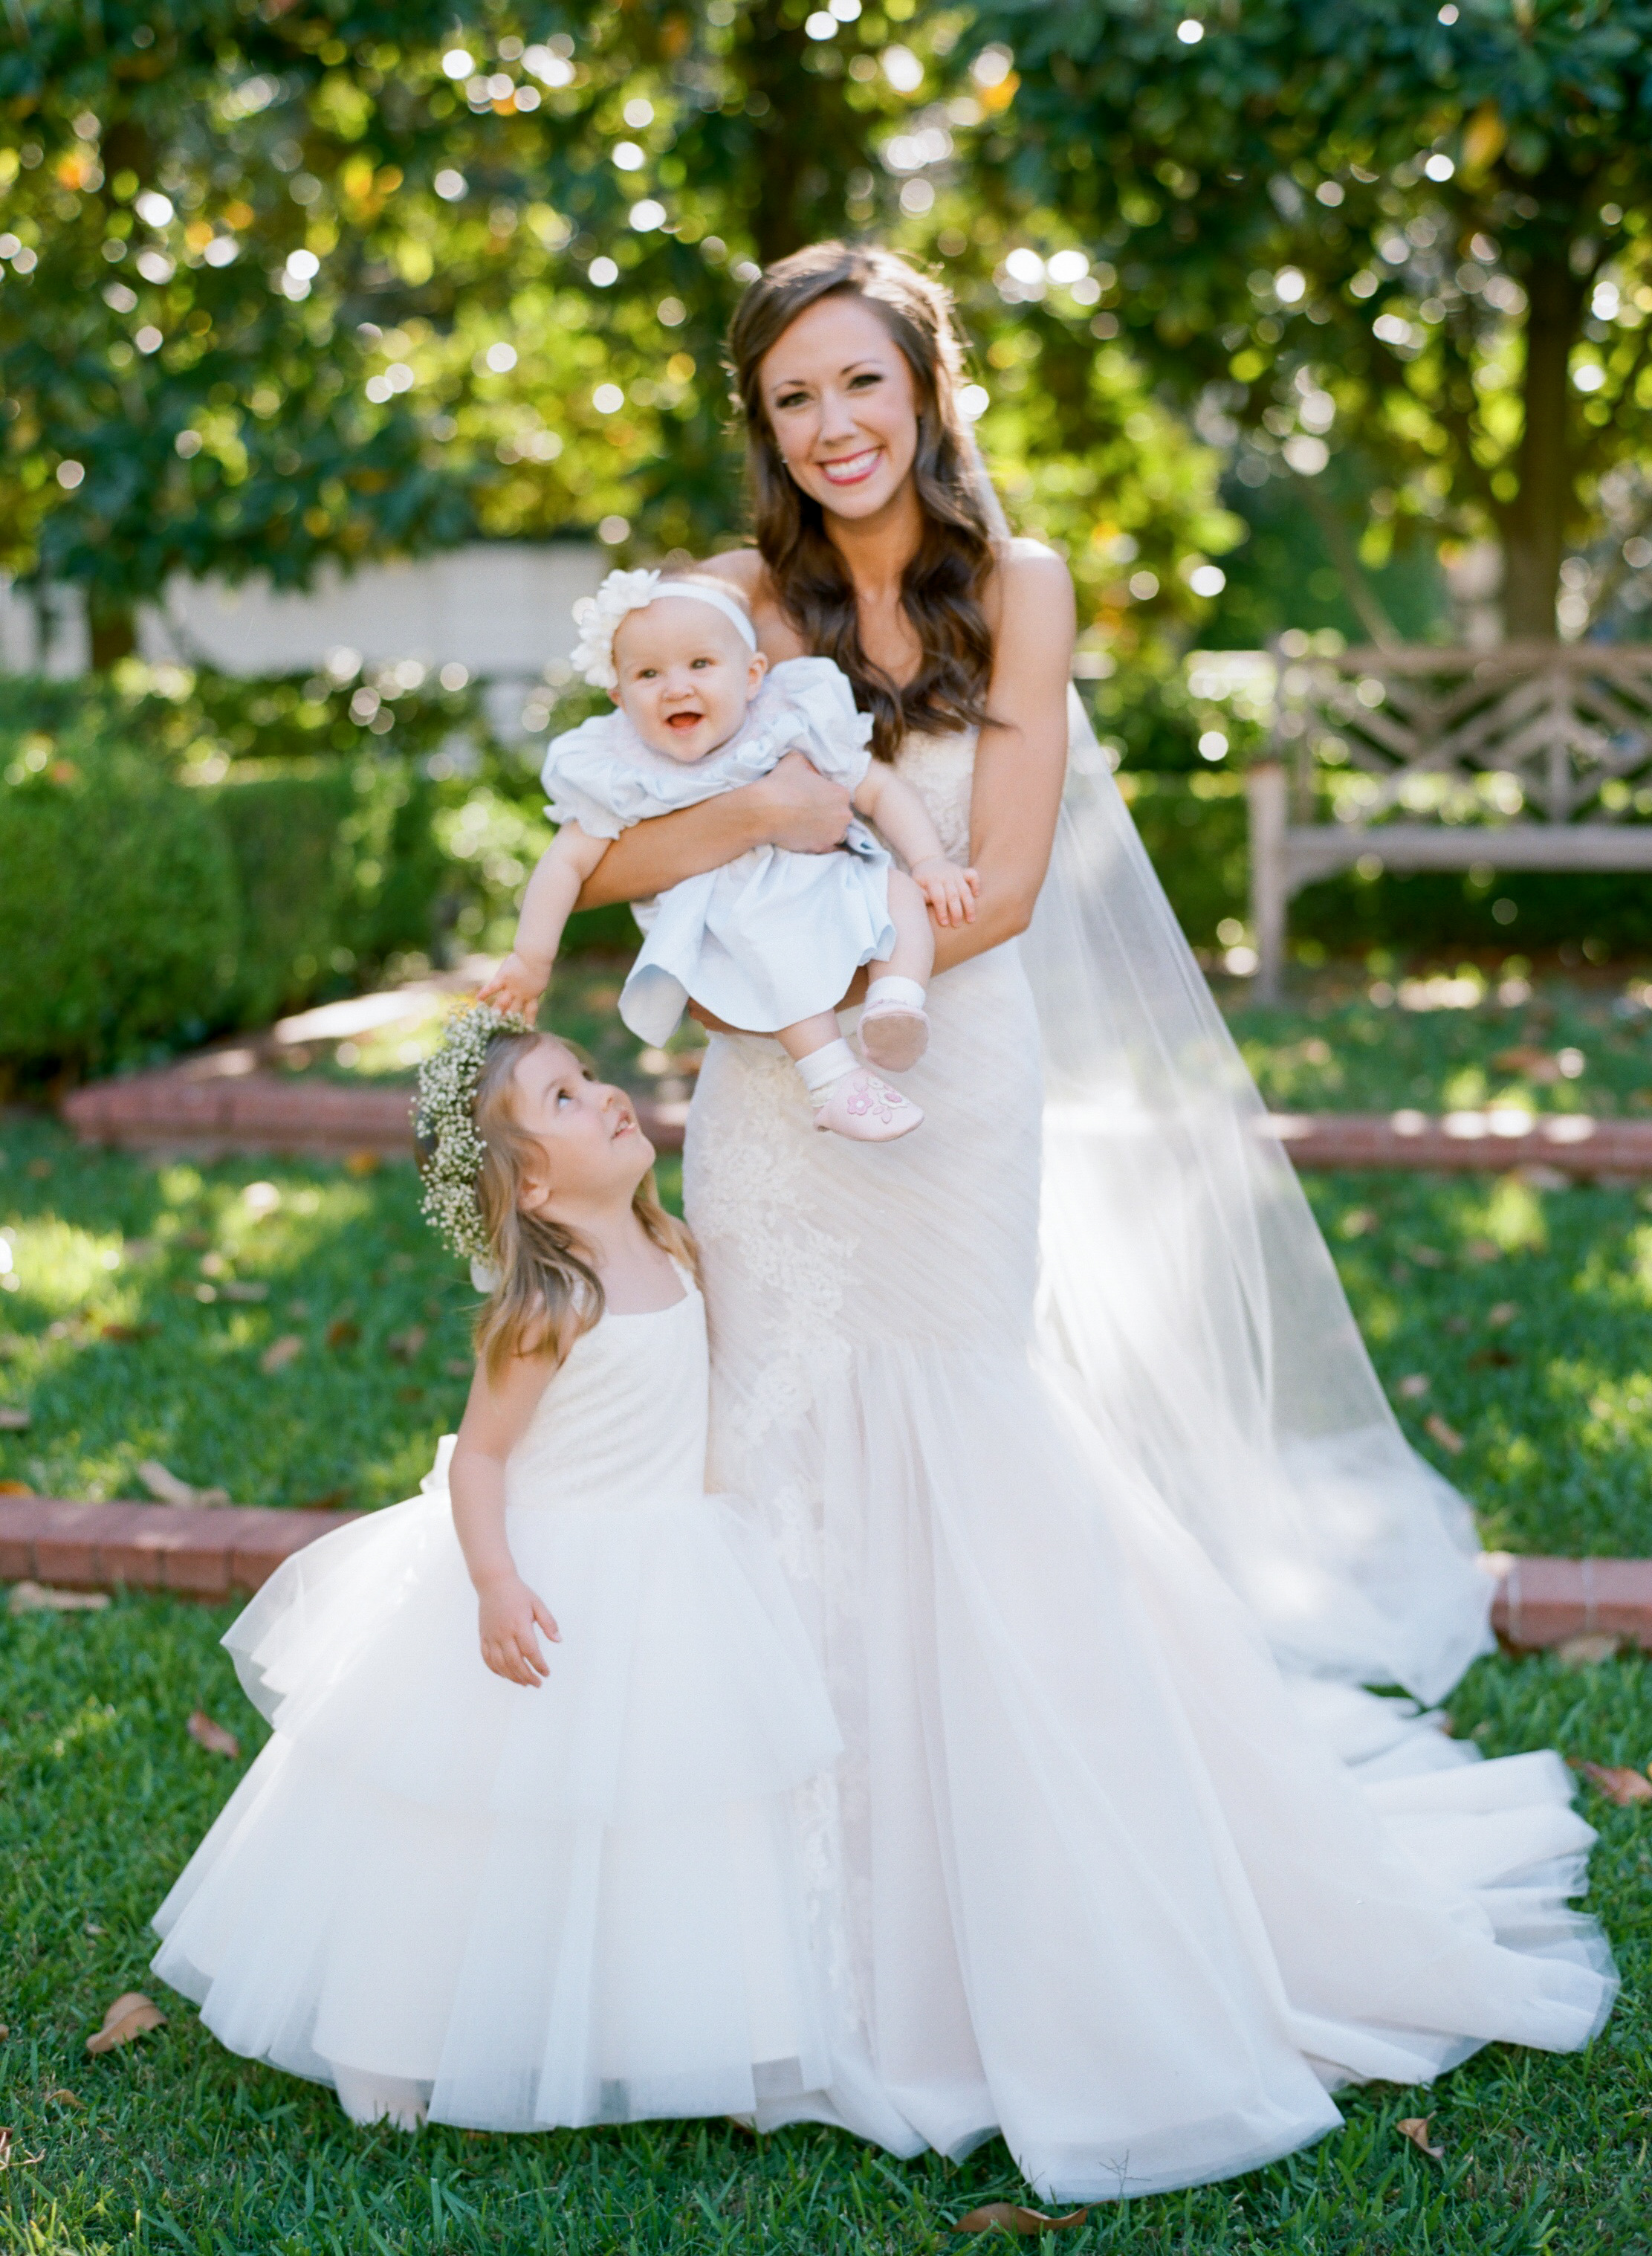 St.-Philip-Presbyterian-Church-Houston-Wedding-Ceremony-The-Junior-League-Of-Houston-Reception-Dana-Fernandez-Photography-Fine-Art-Film-15.jpg